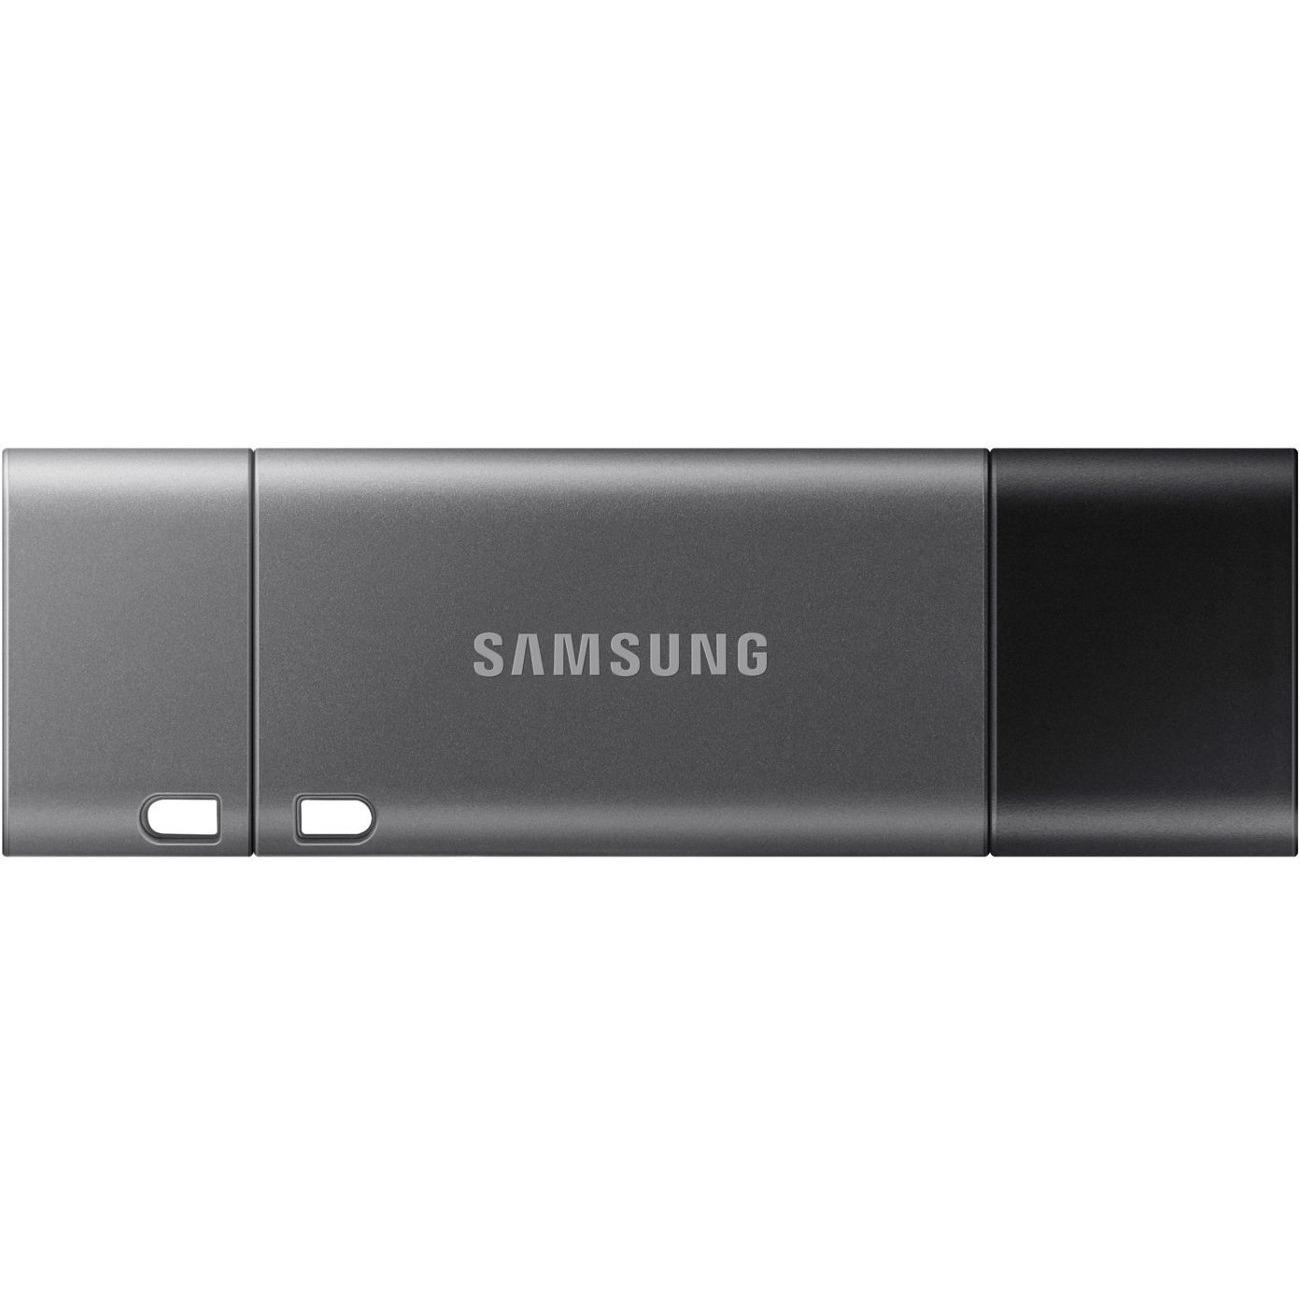 Samsung Duo Plus 64 GB USB 3.1 Type A, USB 3.1 Type C Flash Drive